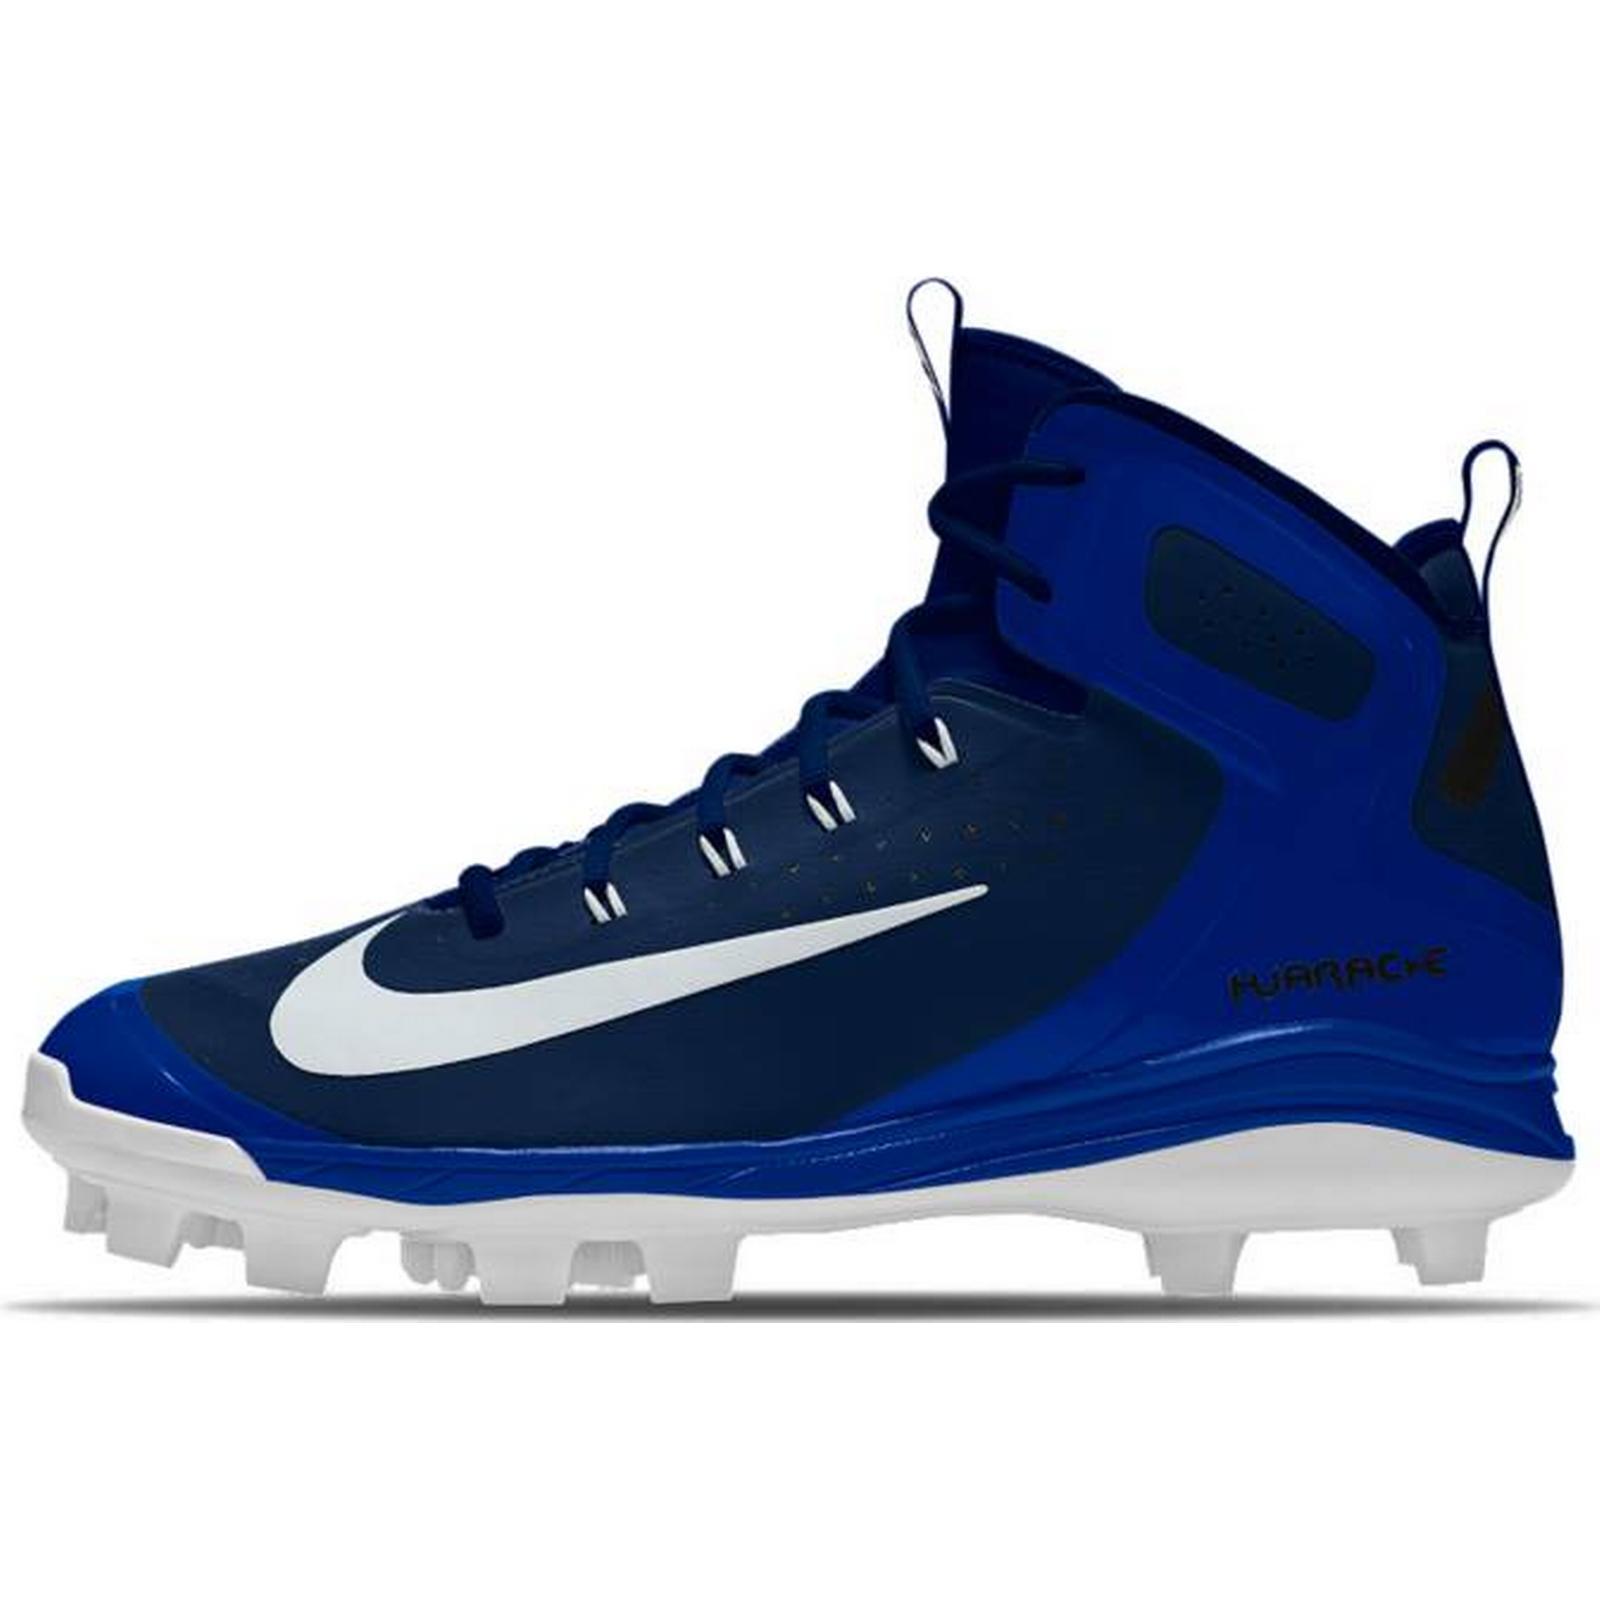 Men's/Women's : NIKE Męskie Korki Do Gry W Baseball Nike MCS Alpha Huarache Elite Mid MCS Nike ID : High Quality 0adb80